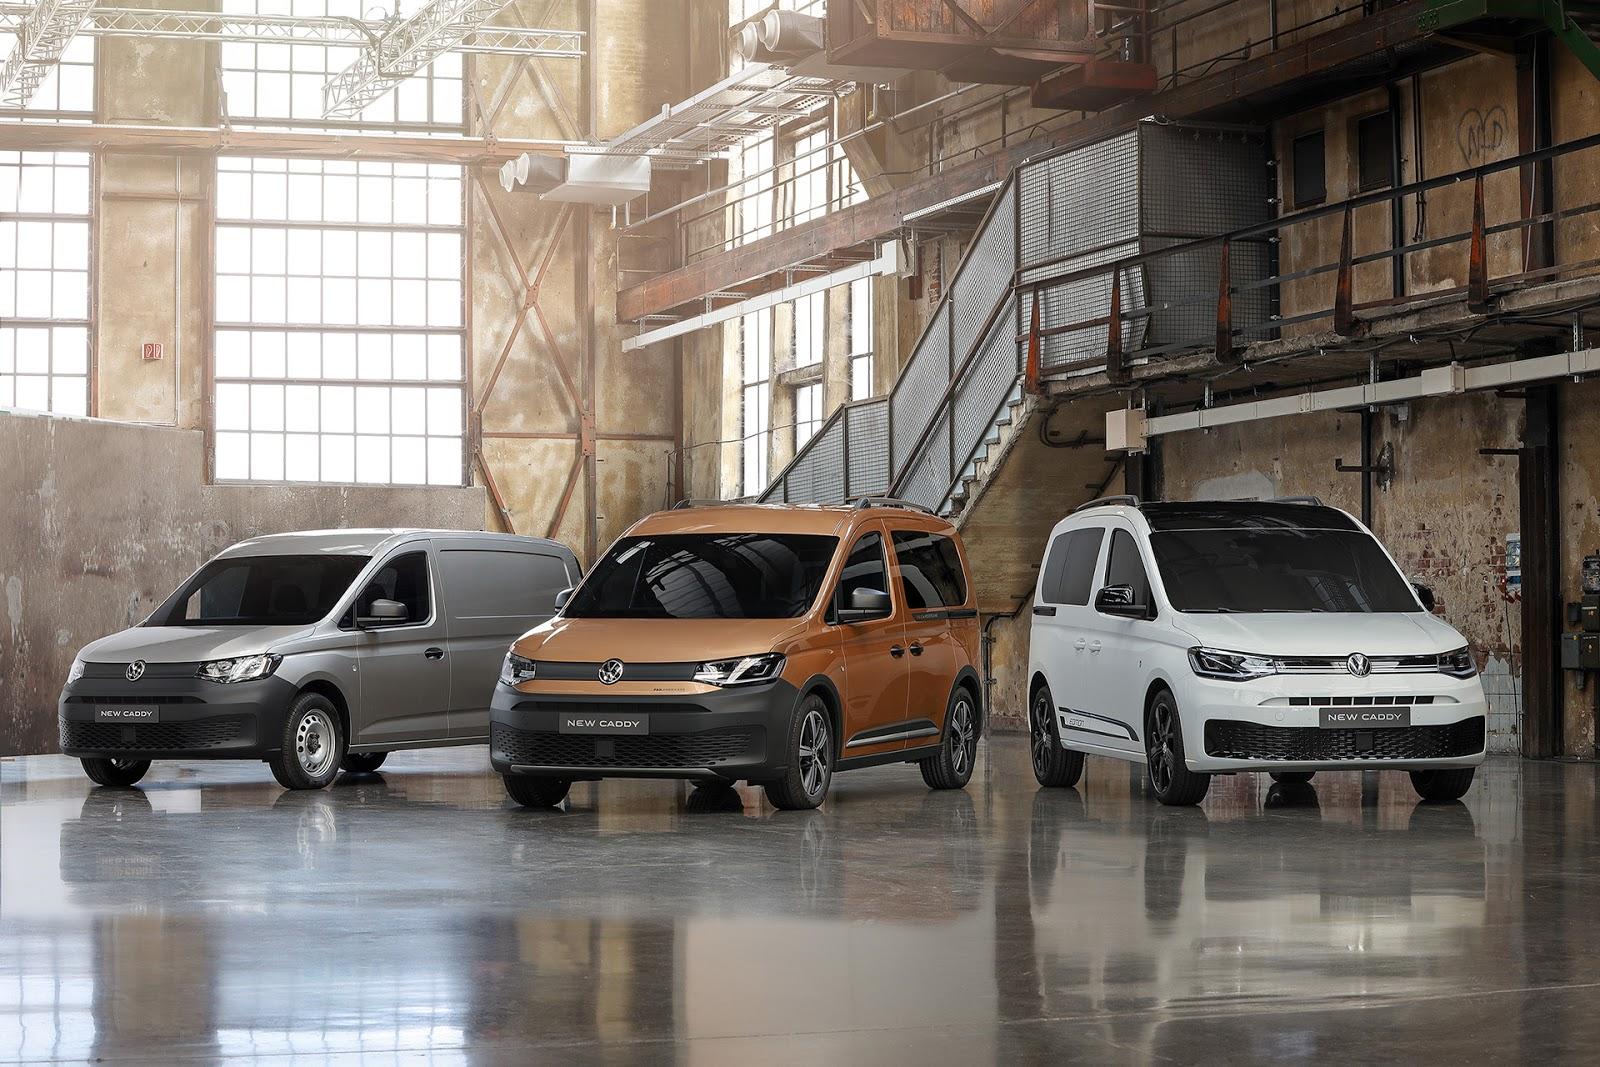 NEO2BVOLKSWAGEN2BCADDY2B5 6 Νέο Volkswagen Caddy 5: μεγαλύτερο, πρακτικότερο, αποδοτικότερο, εξυπνότερο Caddy, MPV, Volkswagen, Volkswagen Caddy, VW, VW Caddy, ειδήσεις, Επαγγελματικά